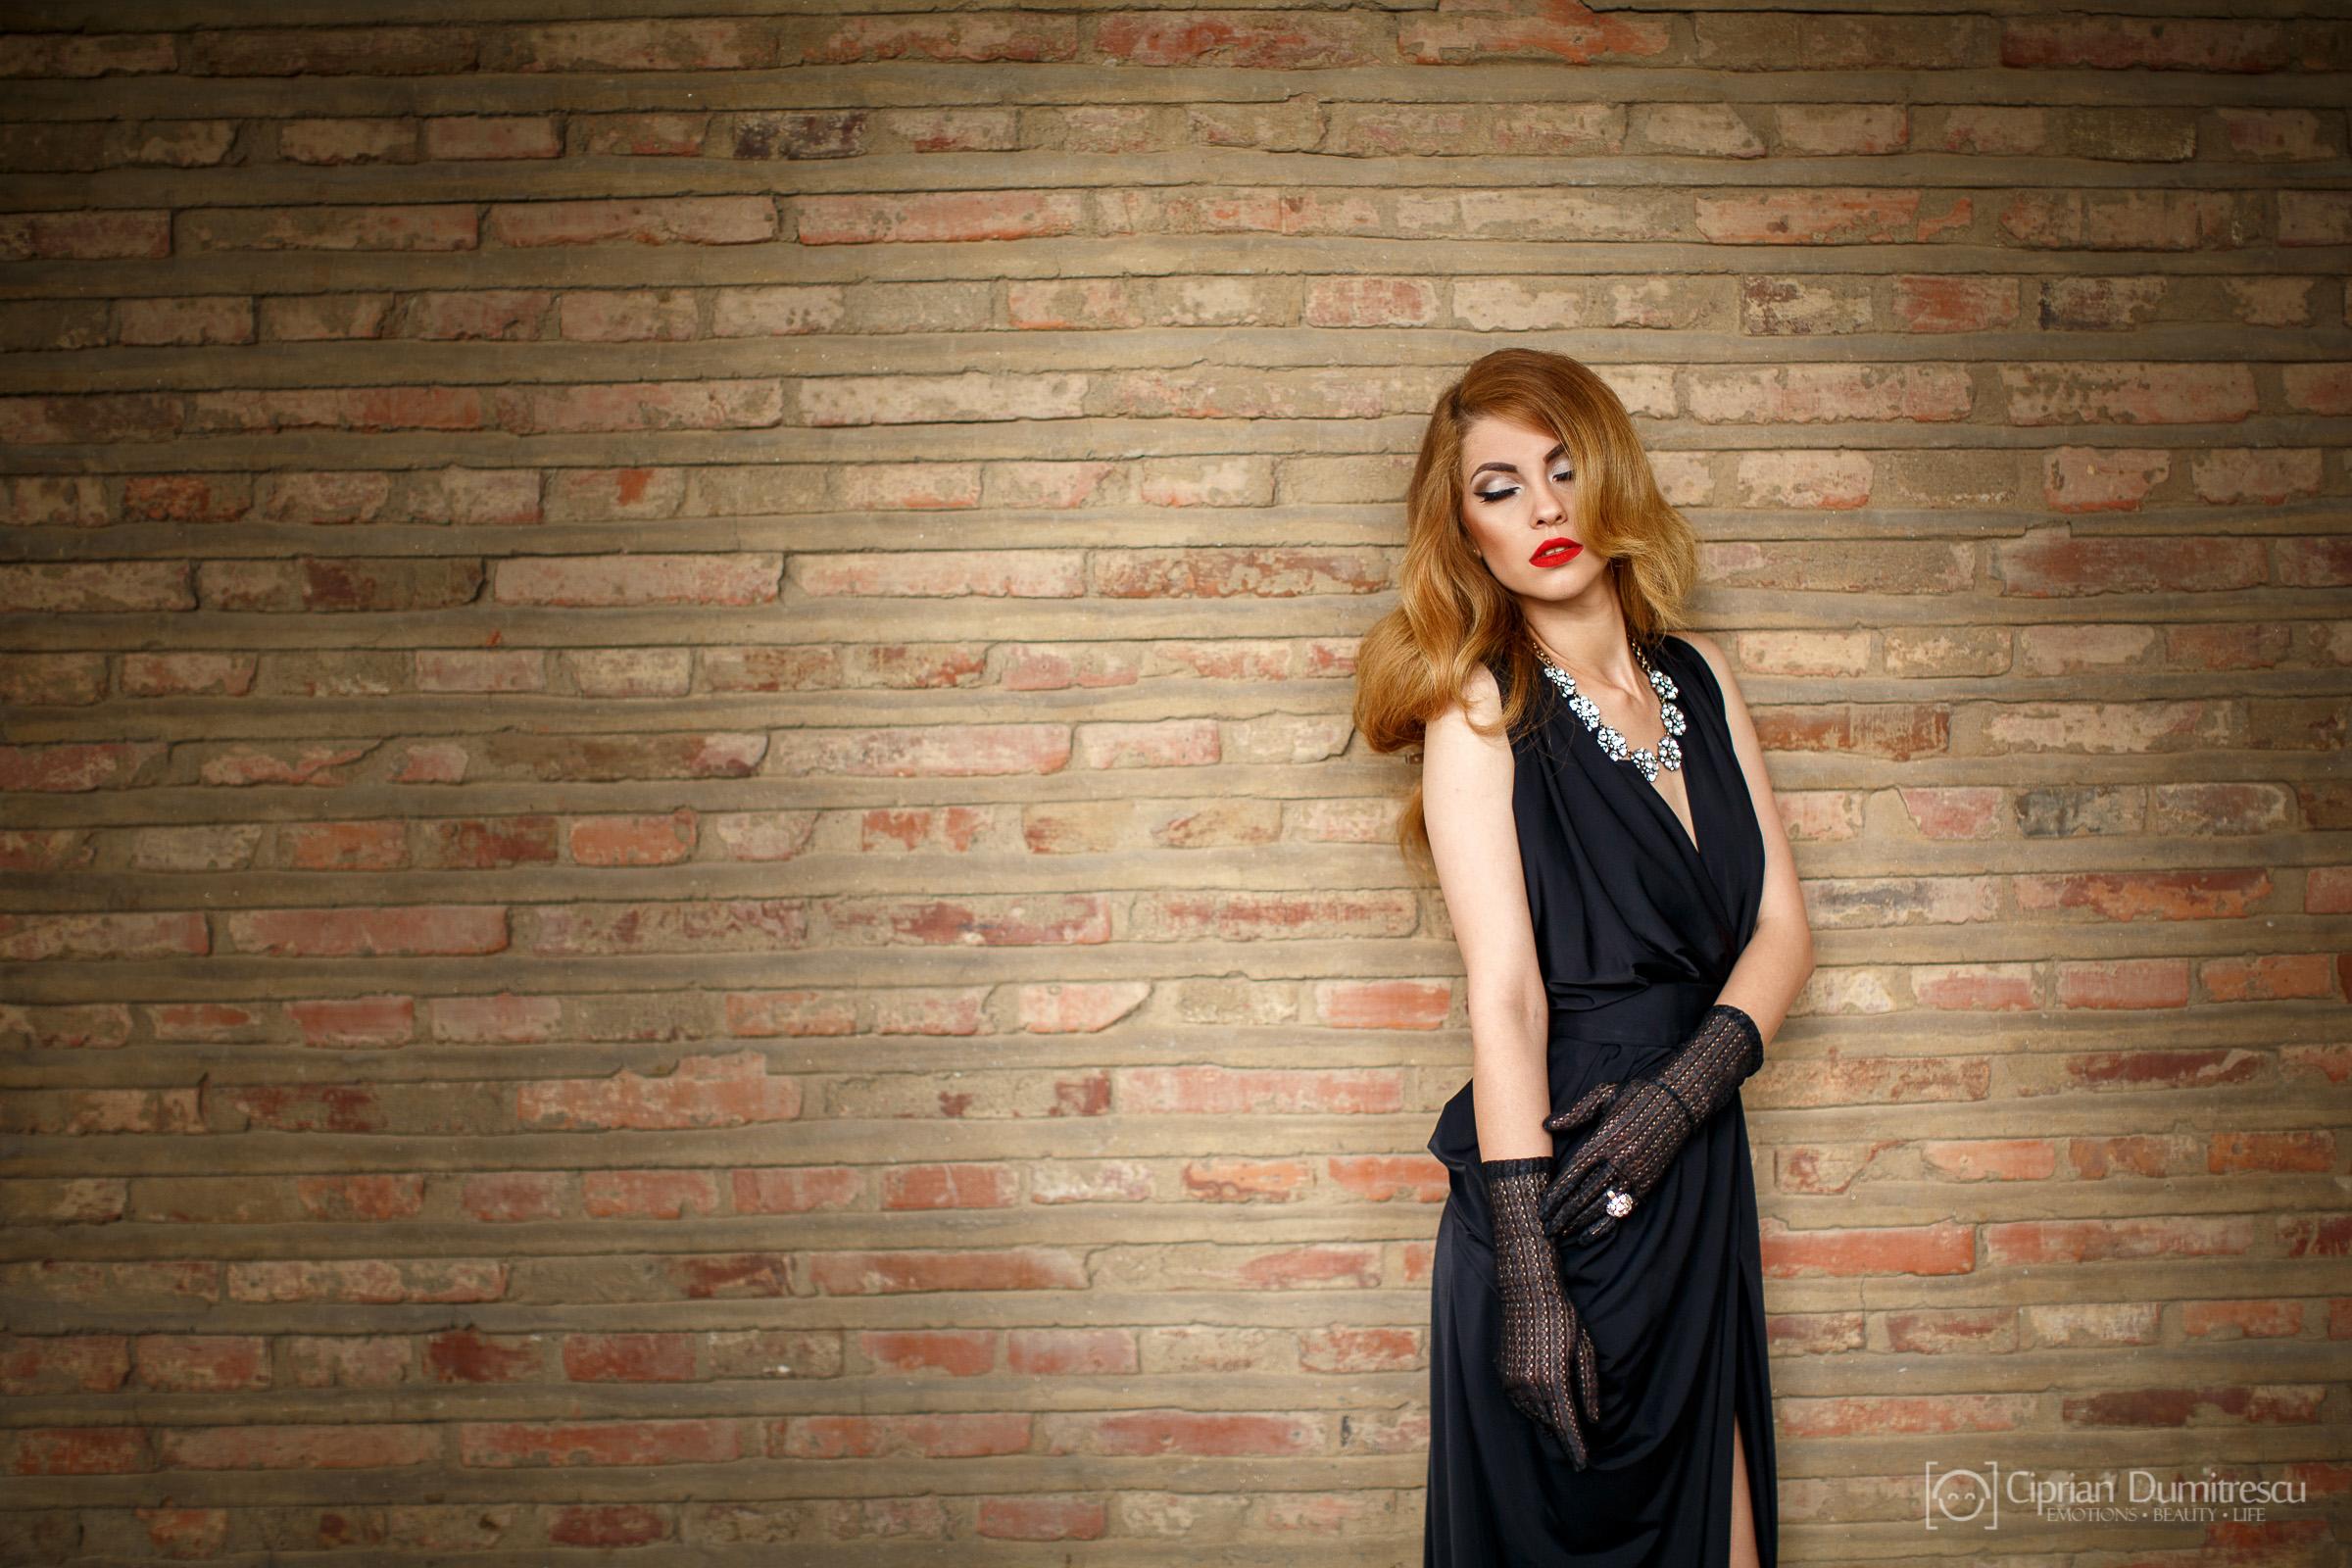 0006-fotografie-fashion-palatul-mogosoaia-fotograf-ciprian-dumitrescu-dcf_1506